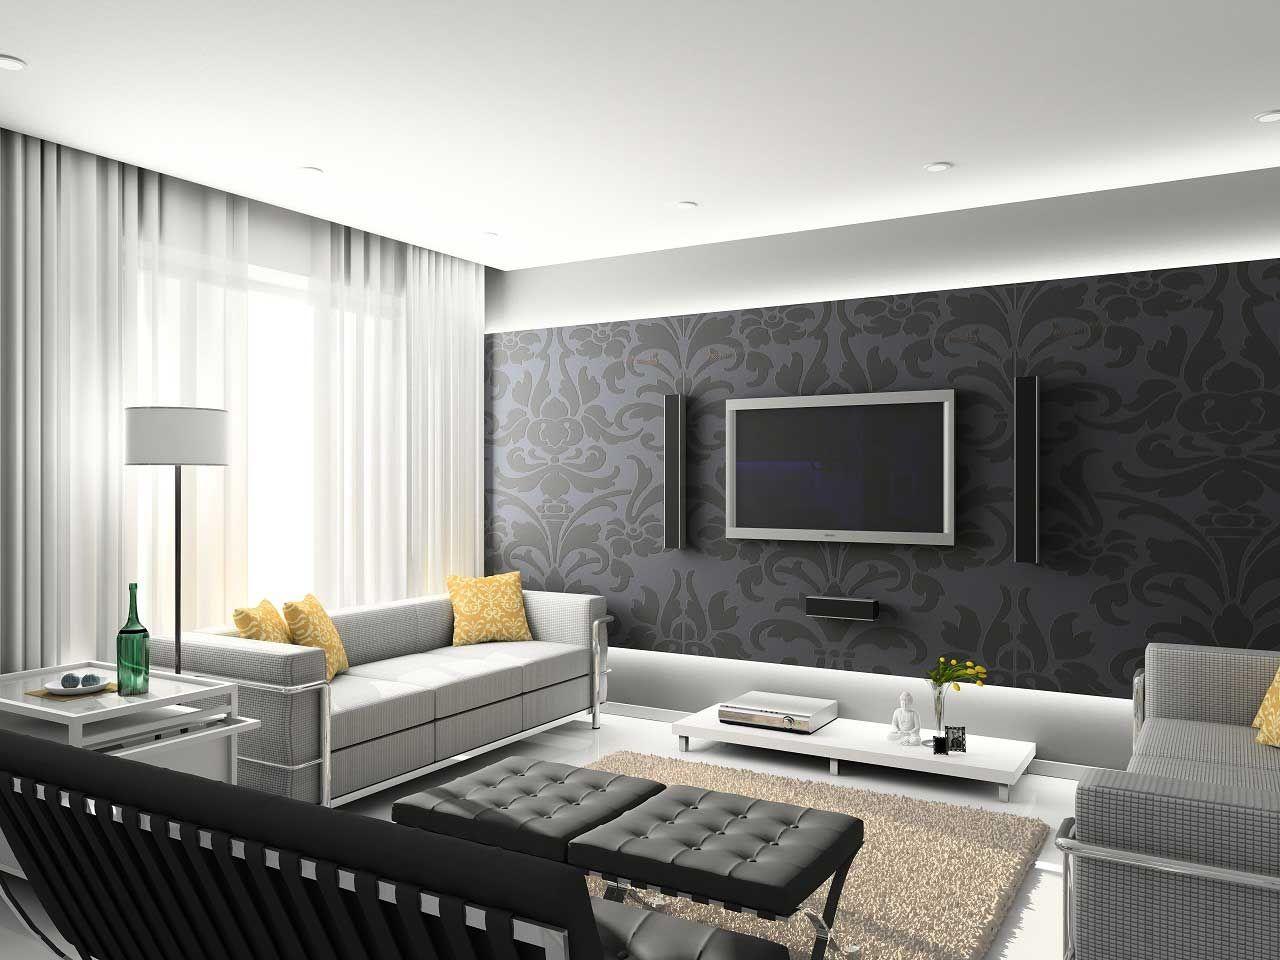 Creative Tv Set Design Living Room Trendy Apartment Homey Small Simple Living Room Design Small Decorating Design